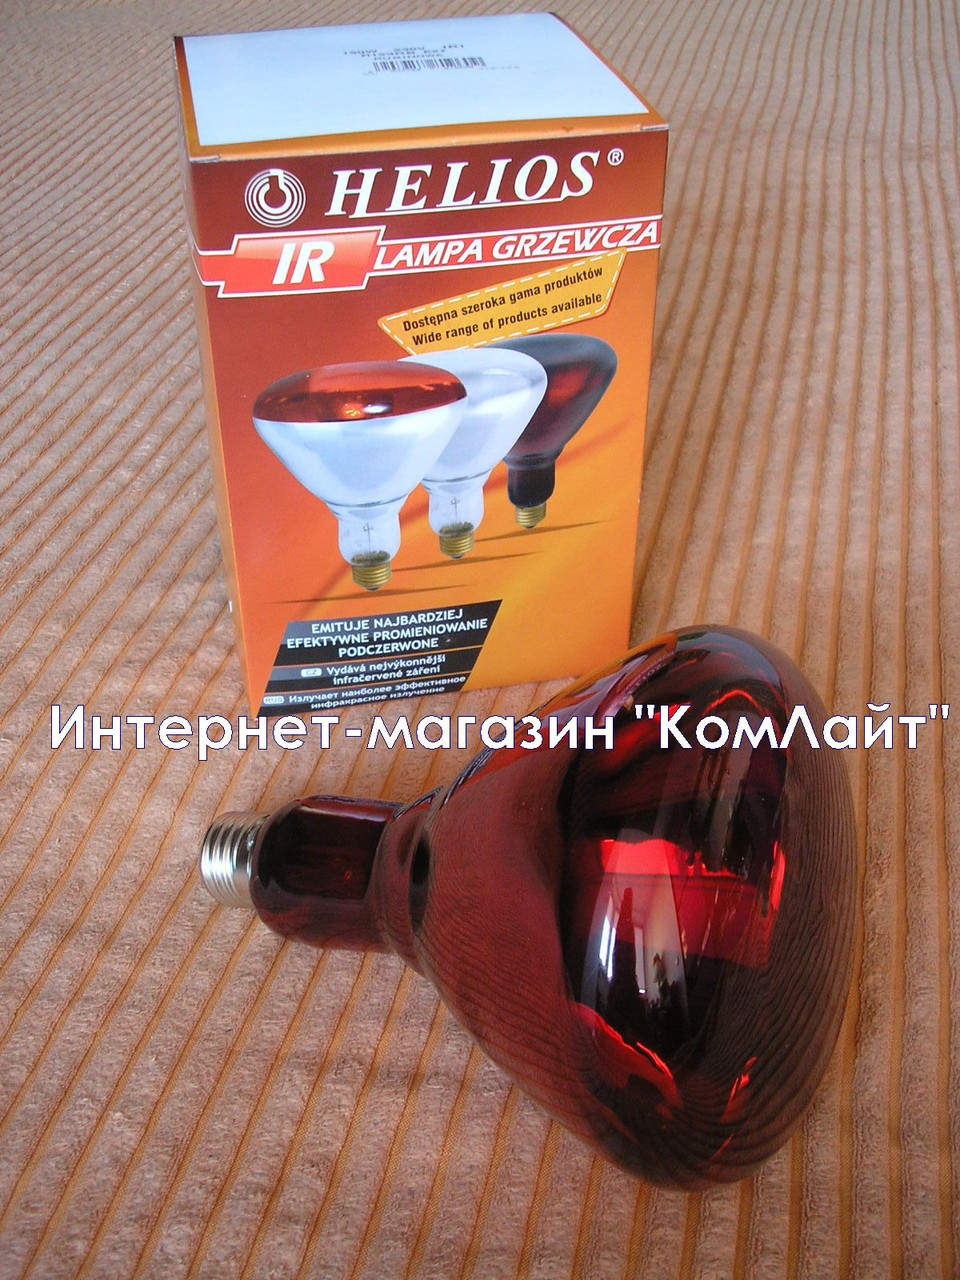 Лампа инфракрасная HELIOS 175W 230V E27 (Польша)